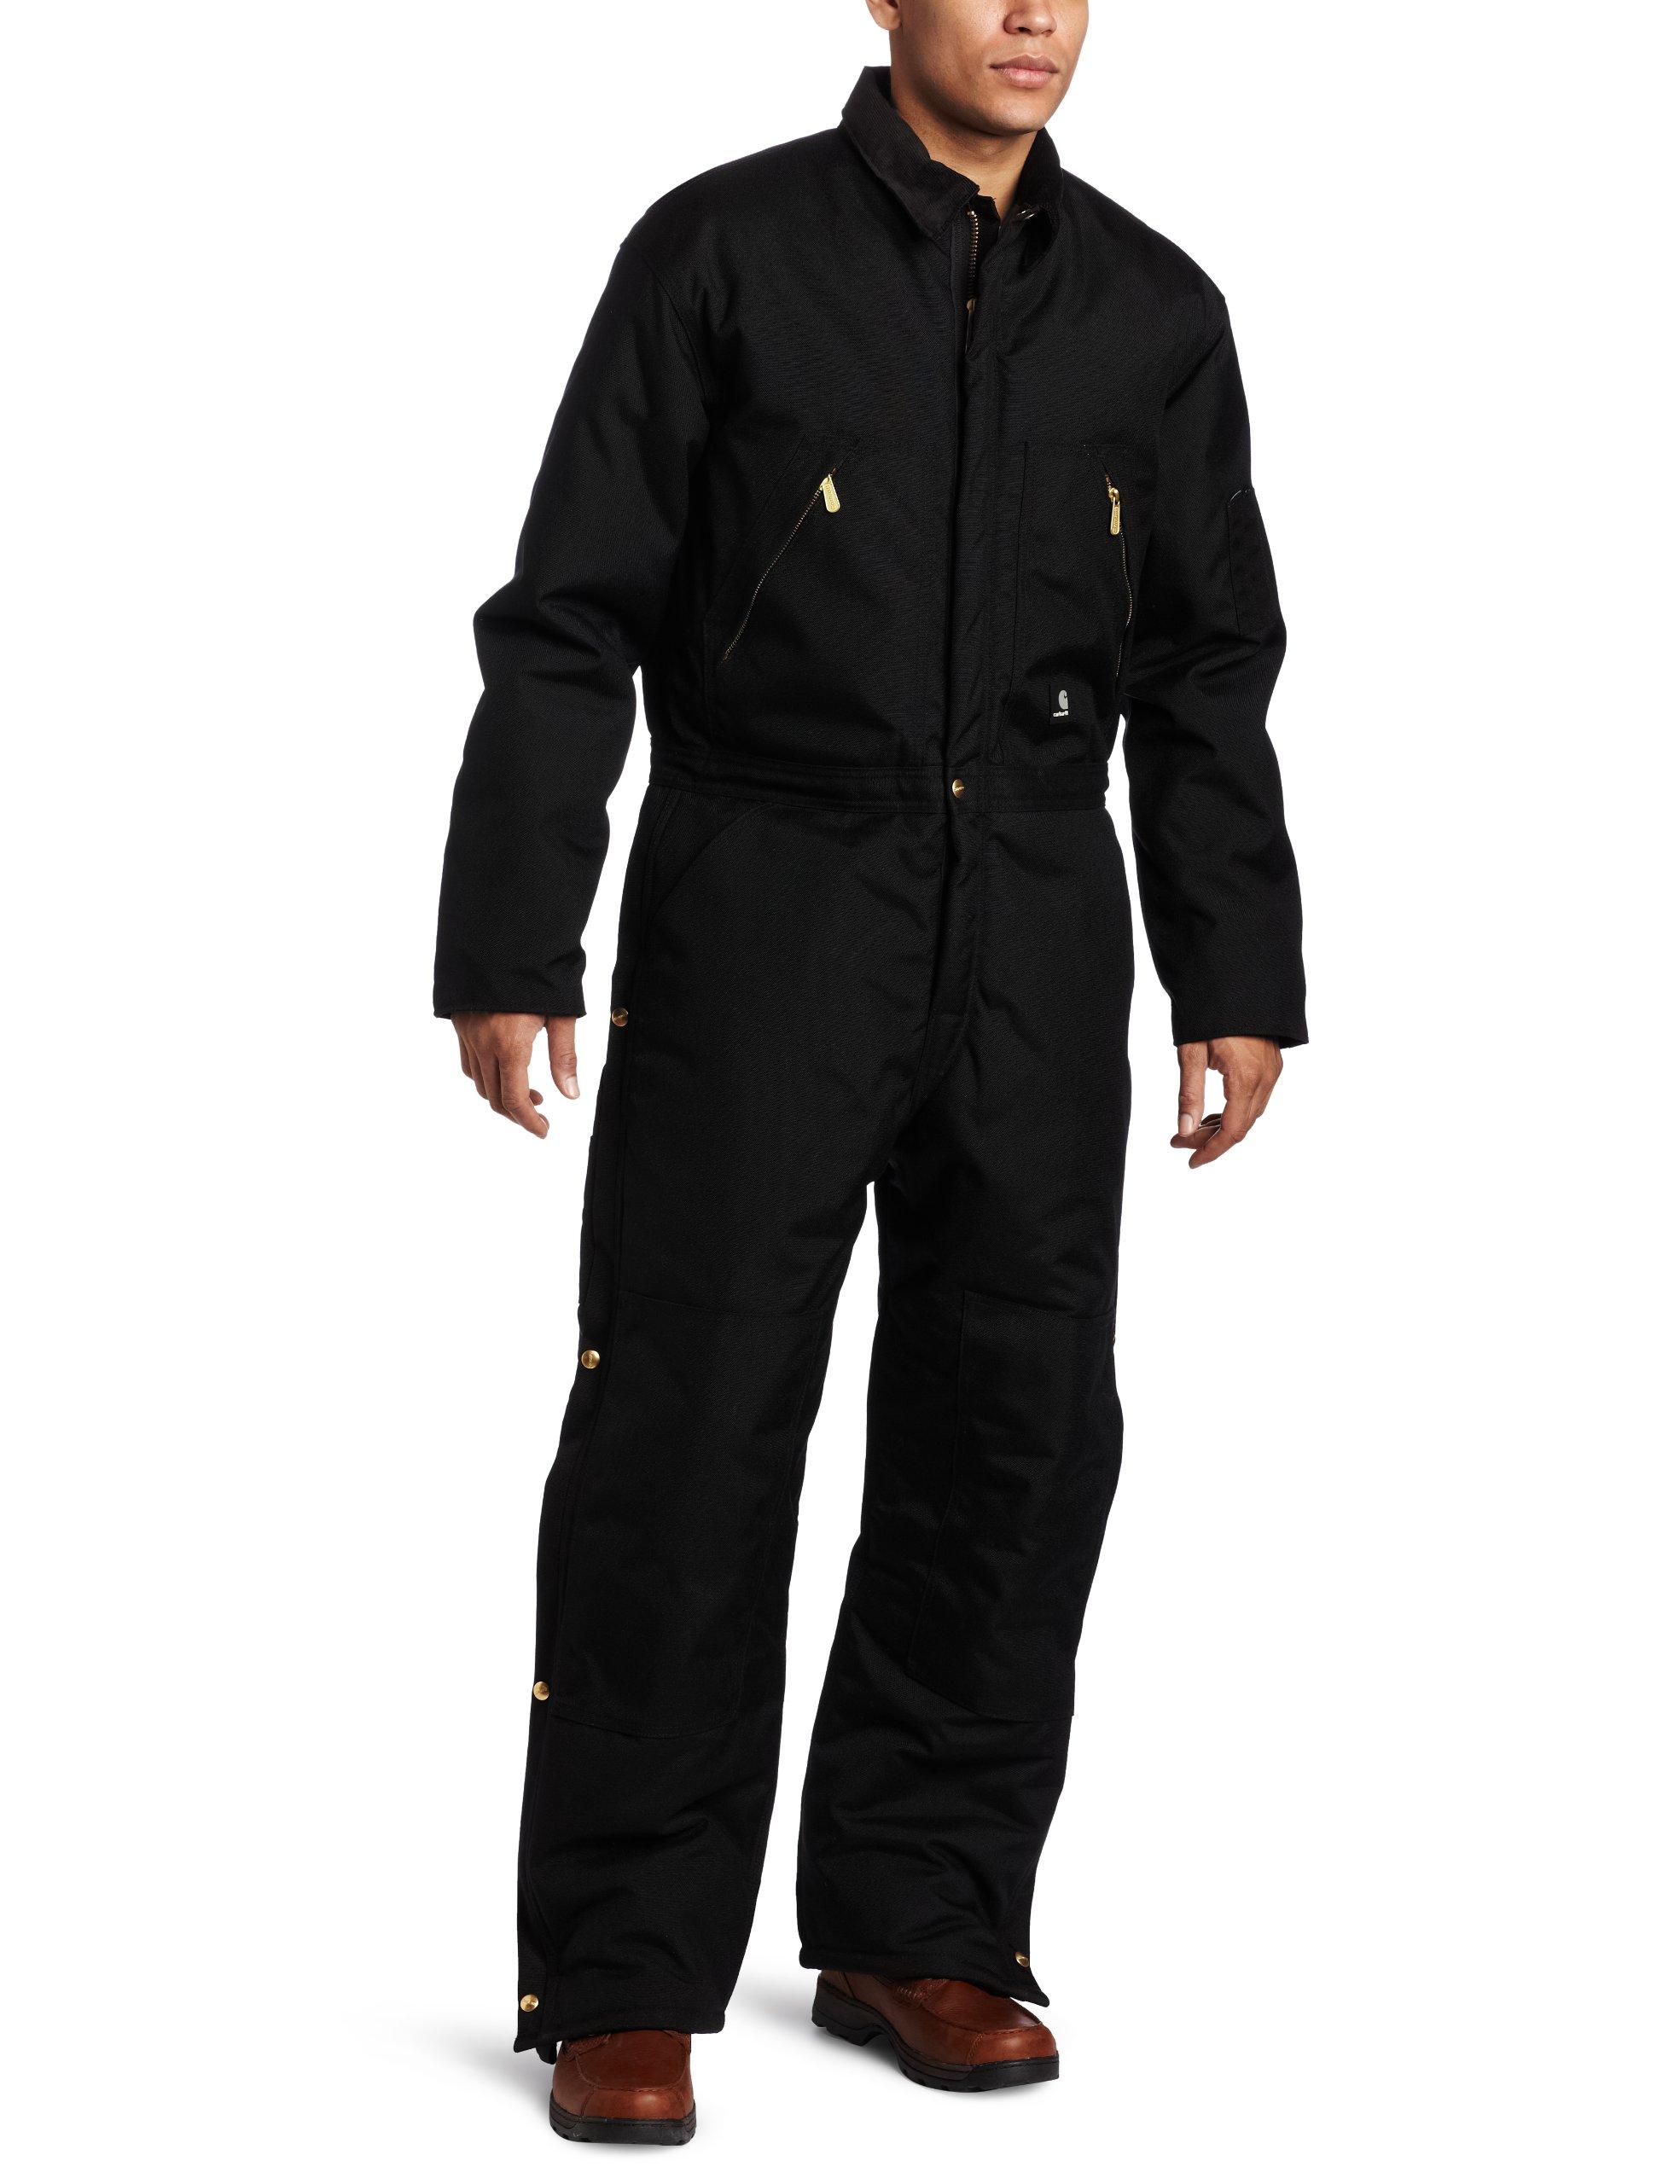 Carhartt Men's Arctic Quilt Lined Yukon Coveralls,Black,50